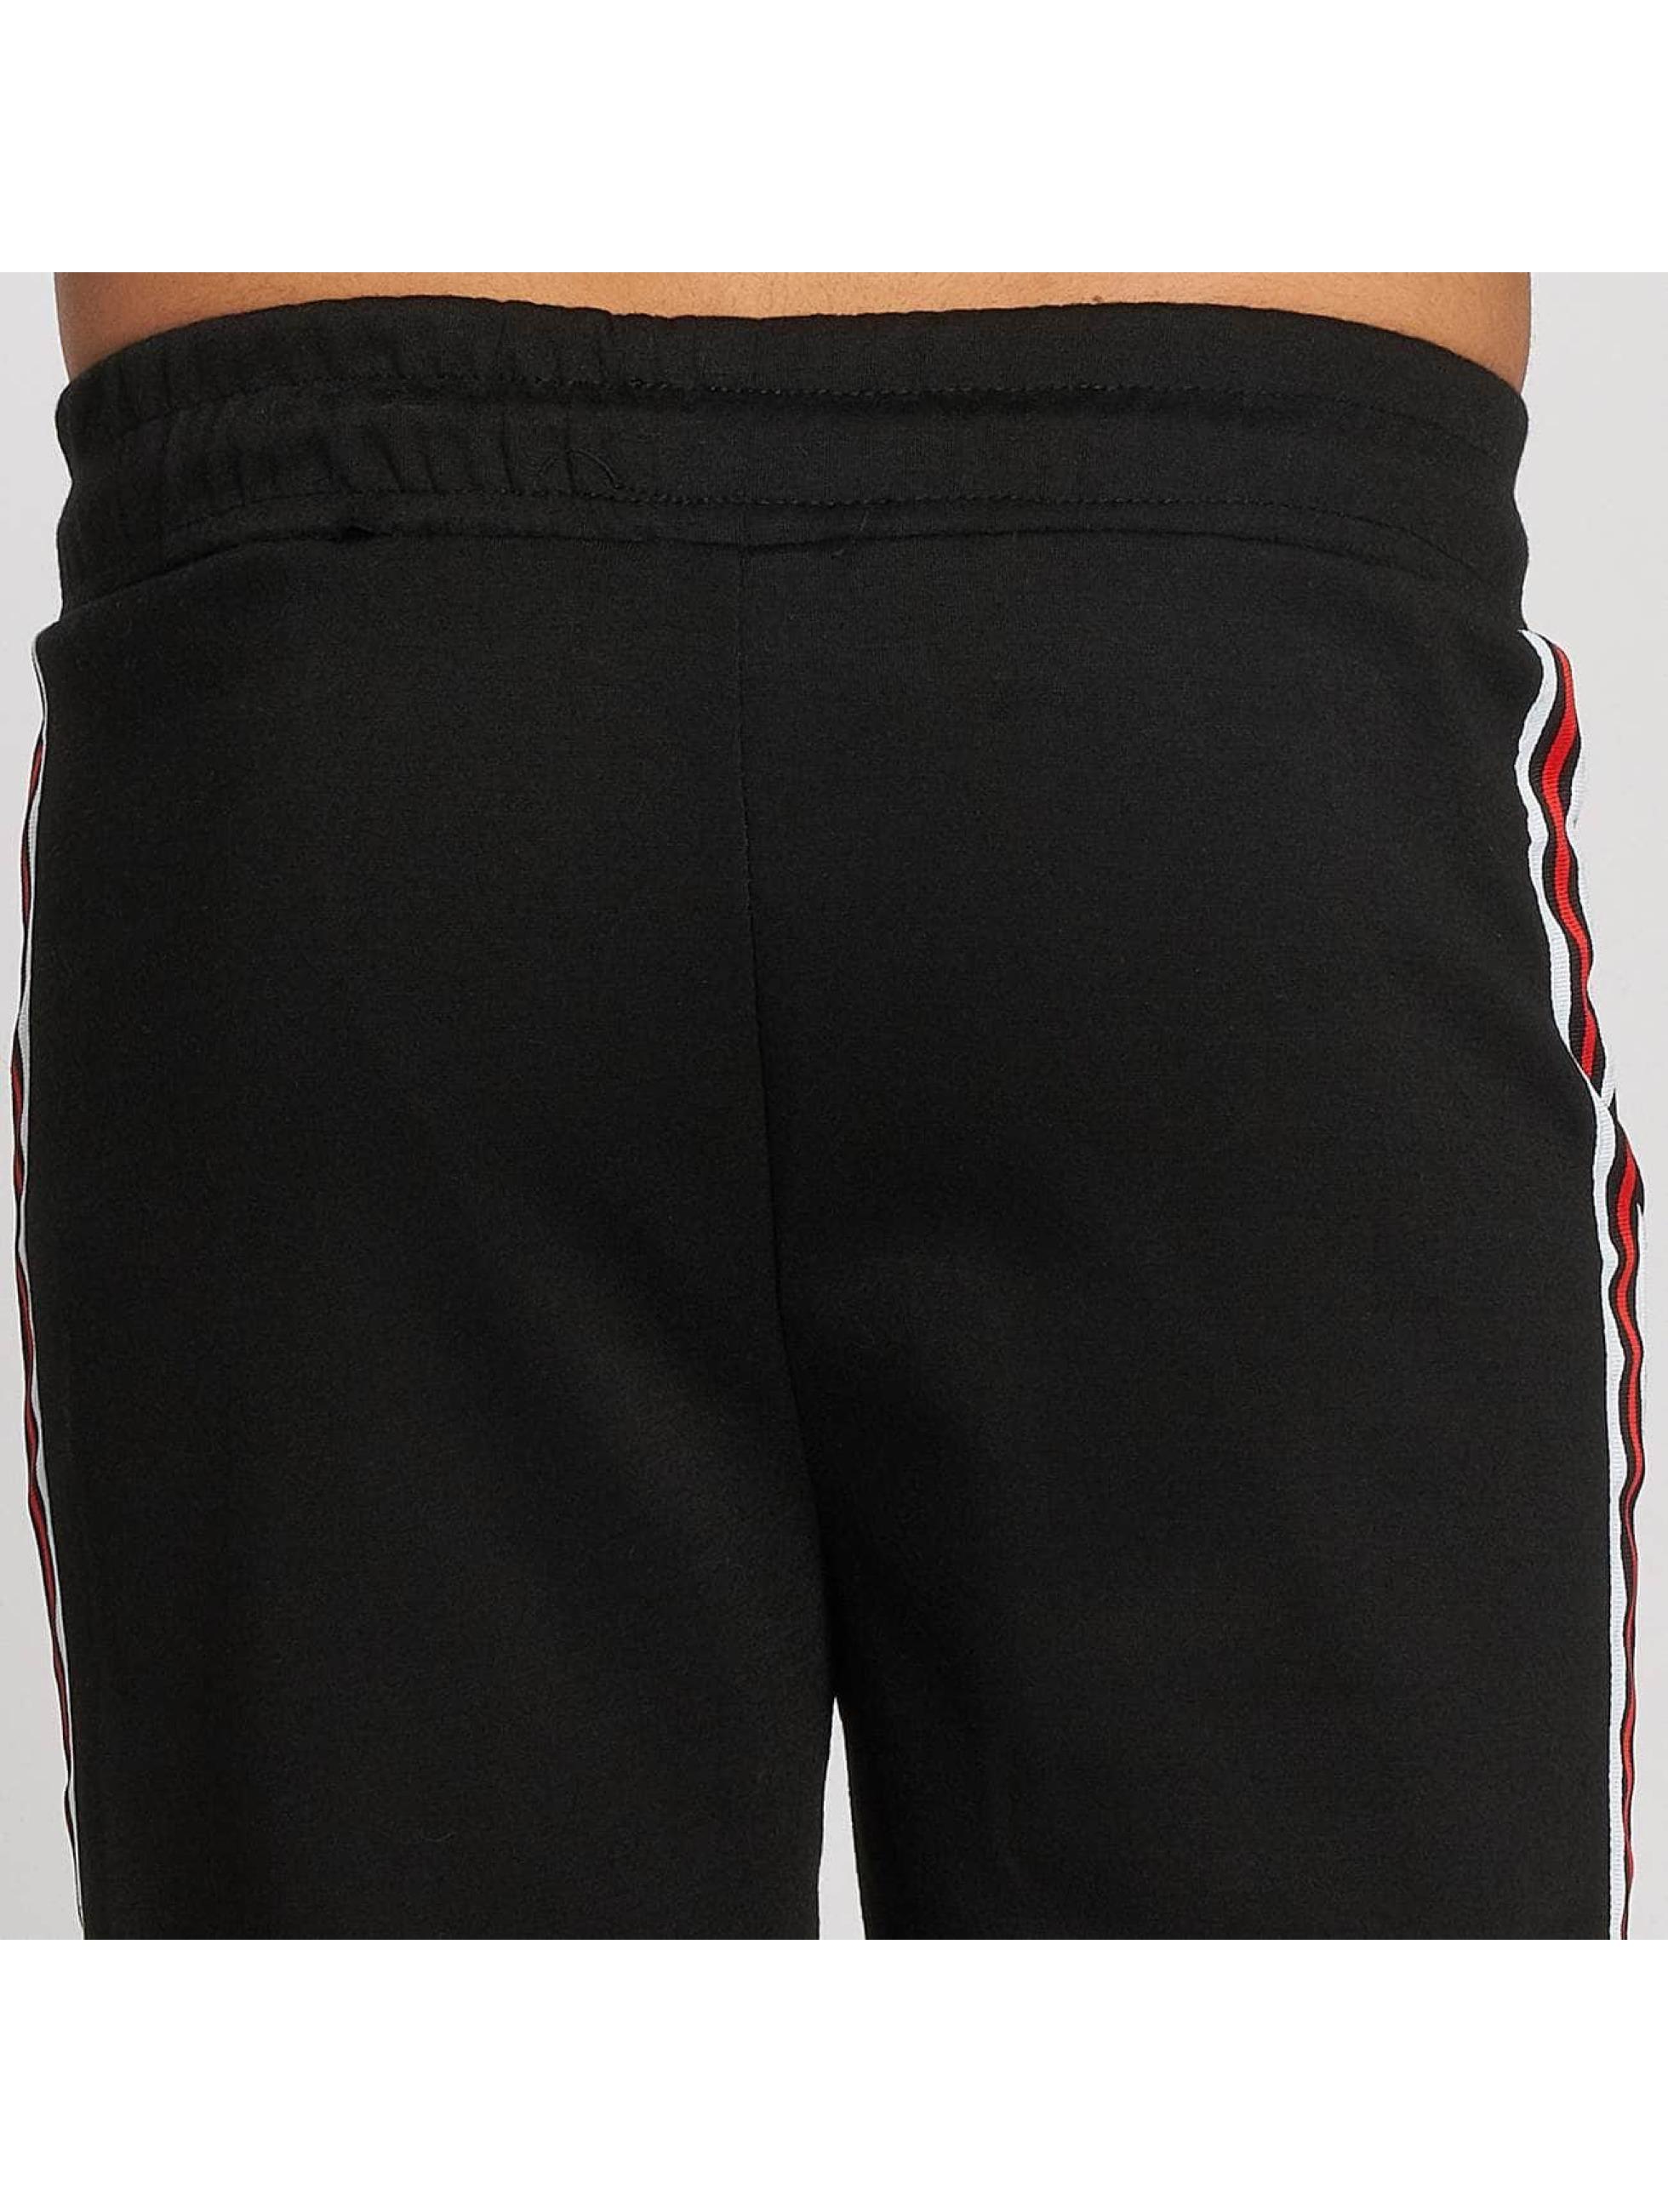 Aarhon Suits Coloured Stripes black